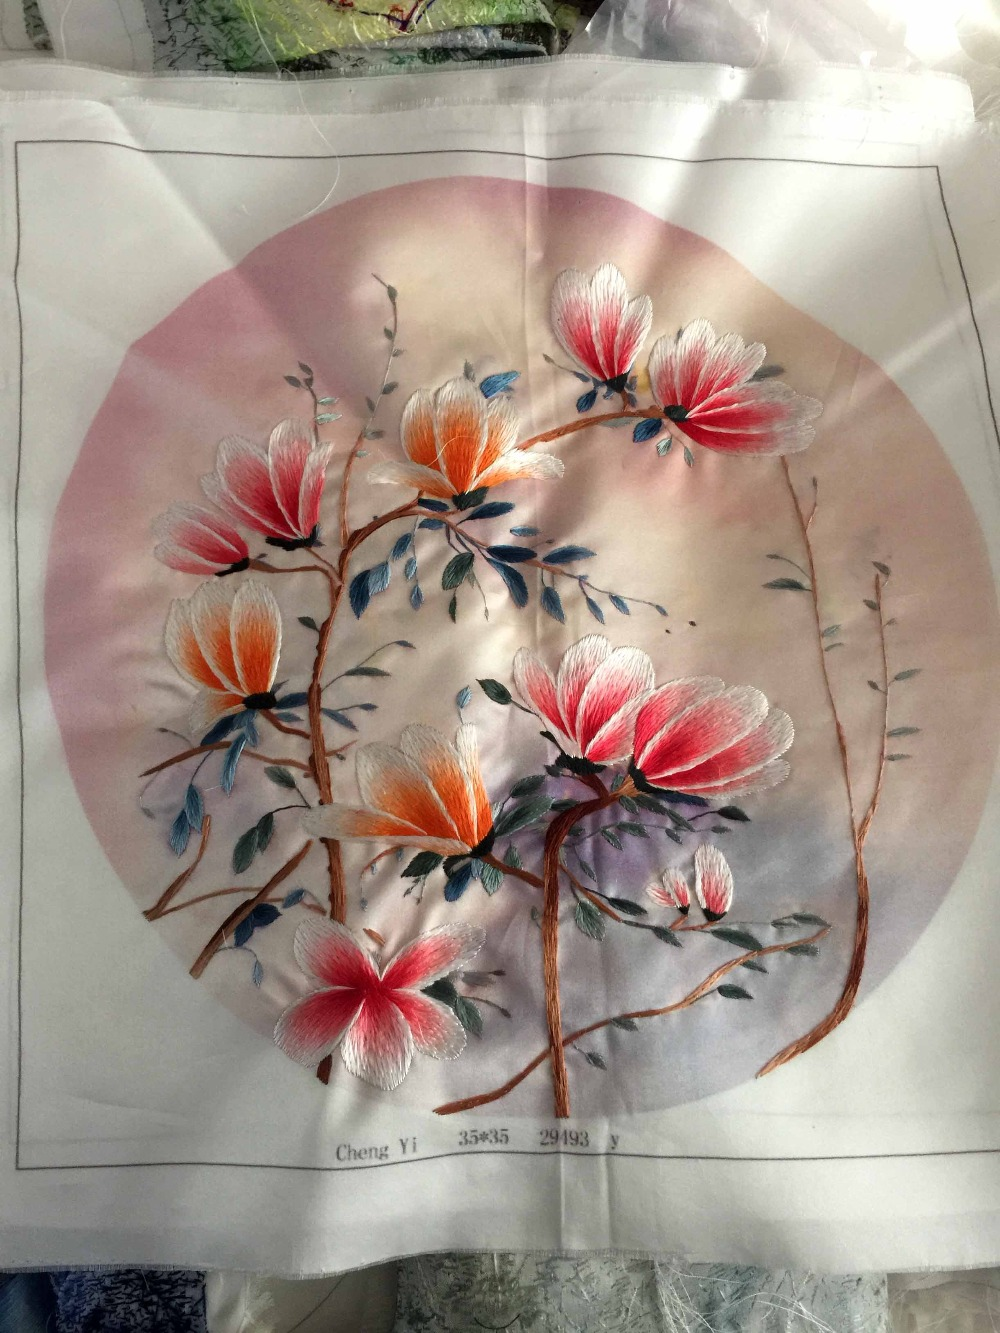 Handmade Pure Silk Stitch Embroidery Painting Arts Decor